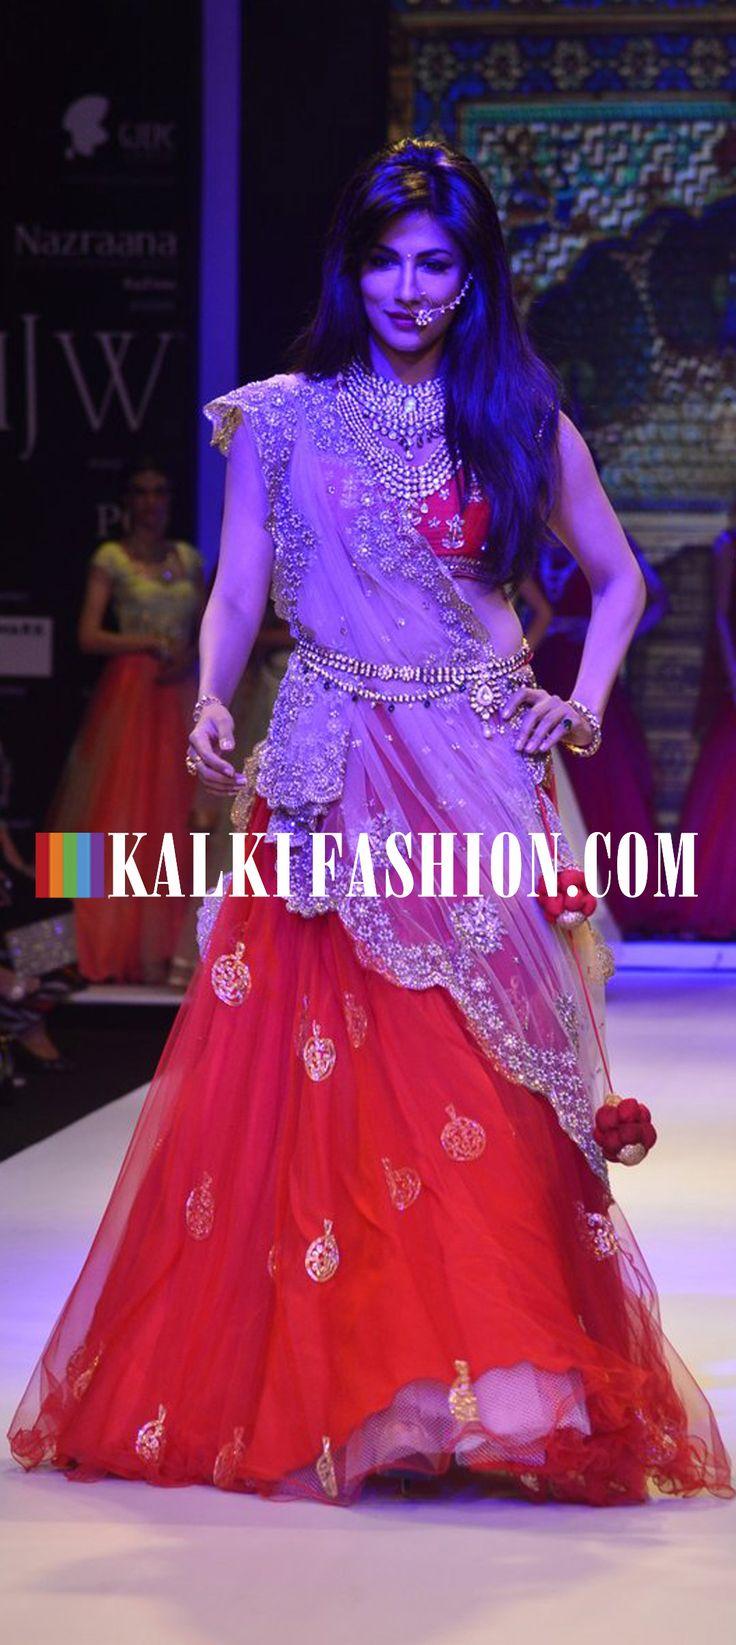 Chitrangda Singh walked the ramp for Moni Agarwal in red and beige bridal lehenga at India International Jewellery week 2014. http://www.kalkifashion.com/